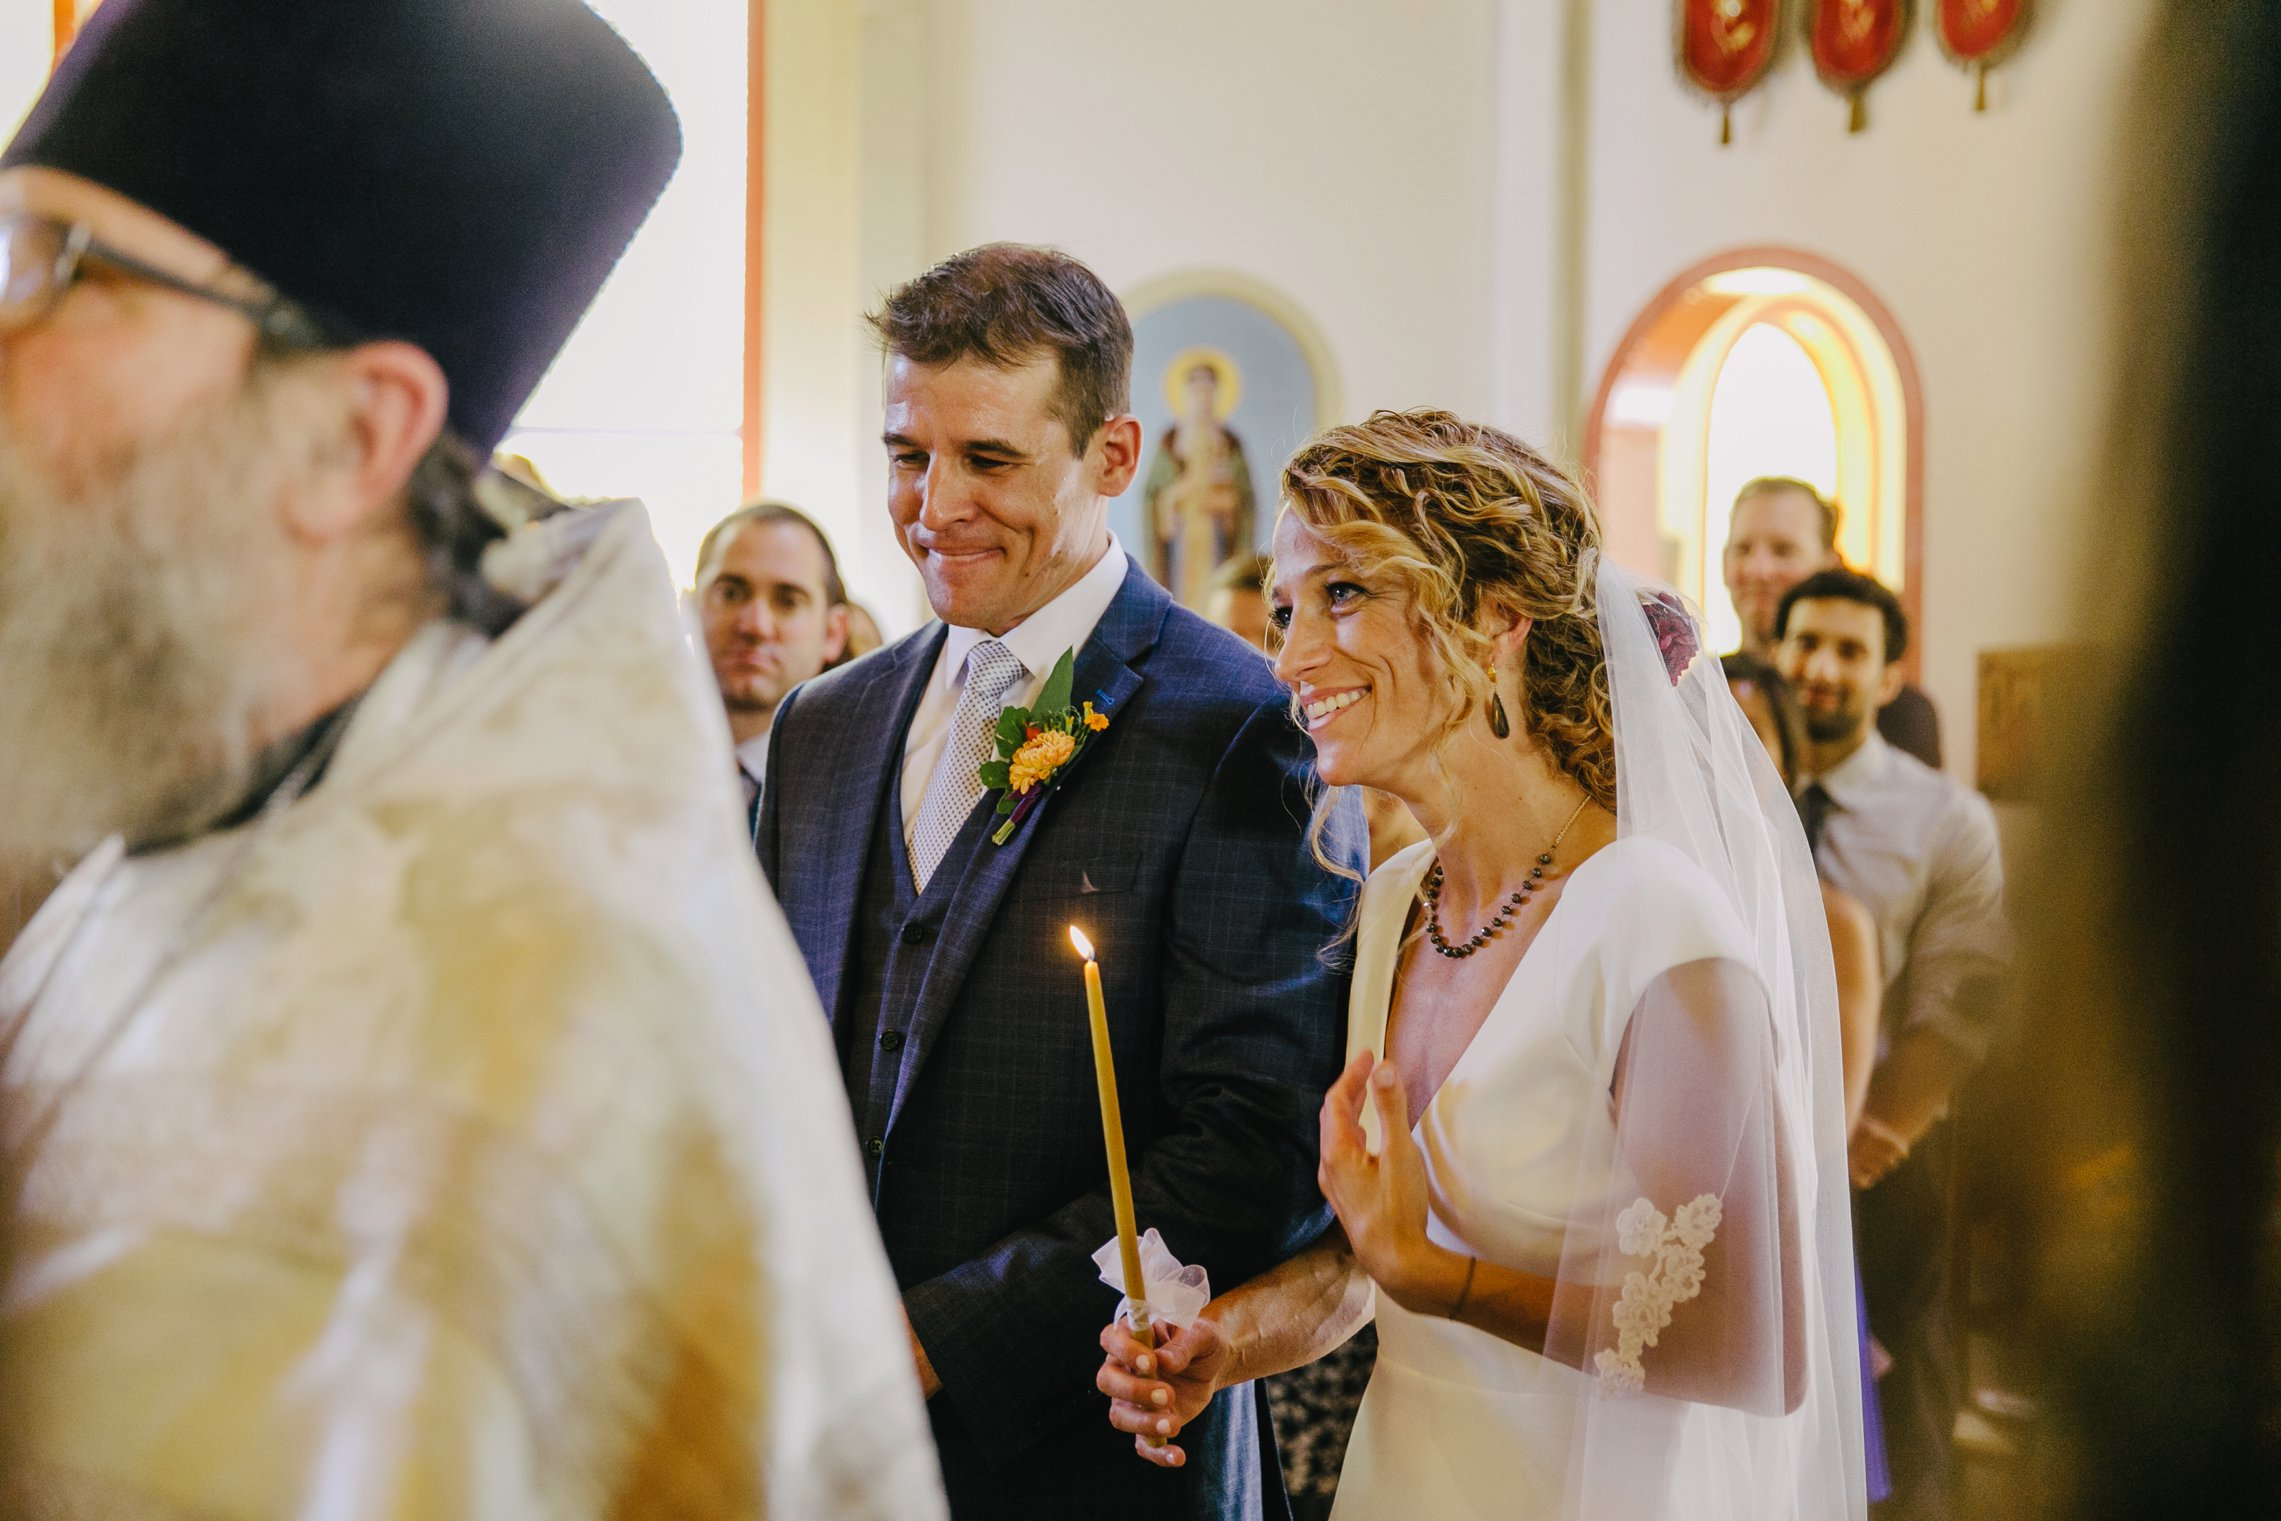 stnicholas_studio333_wedding_0014.jpg